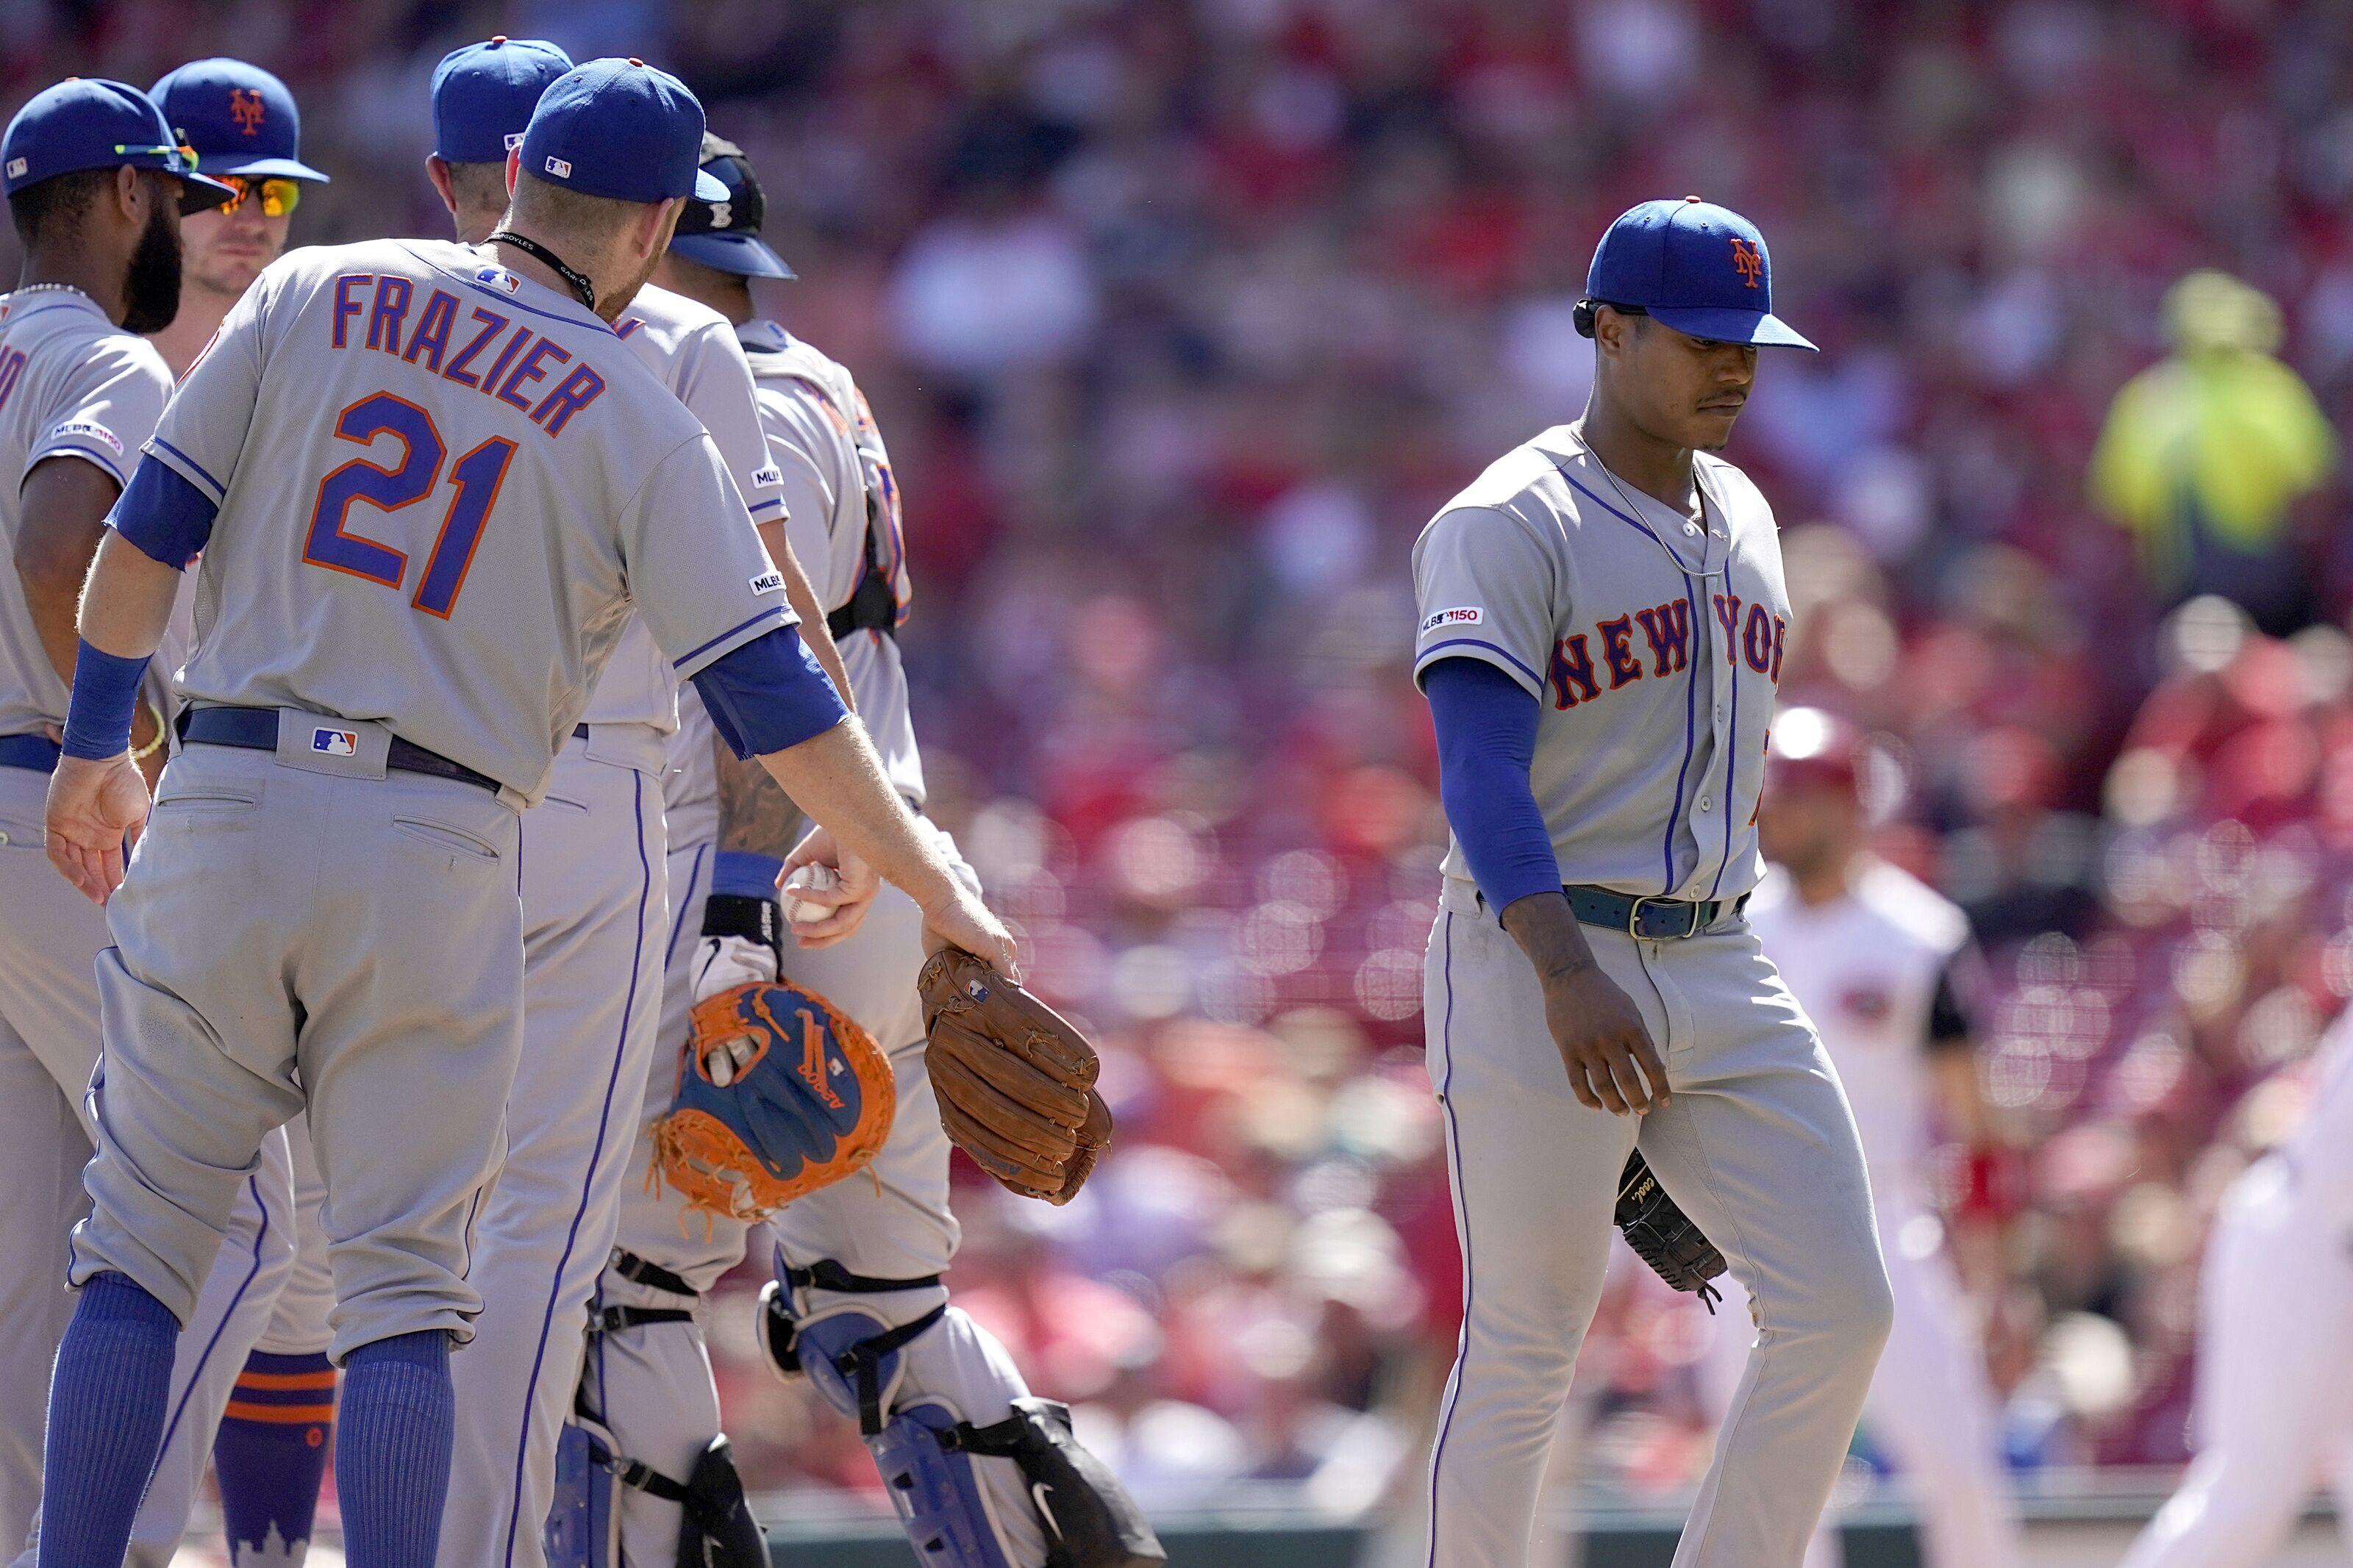 Marcus Stroman effective but doesn't pick up win for Mets in Cincinnati